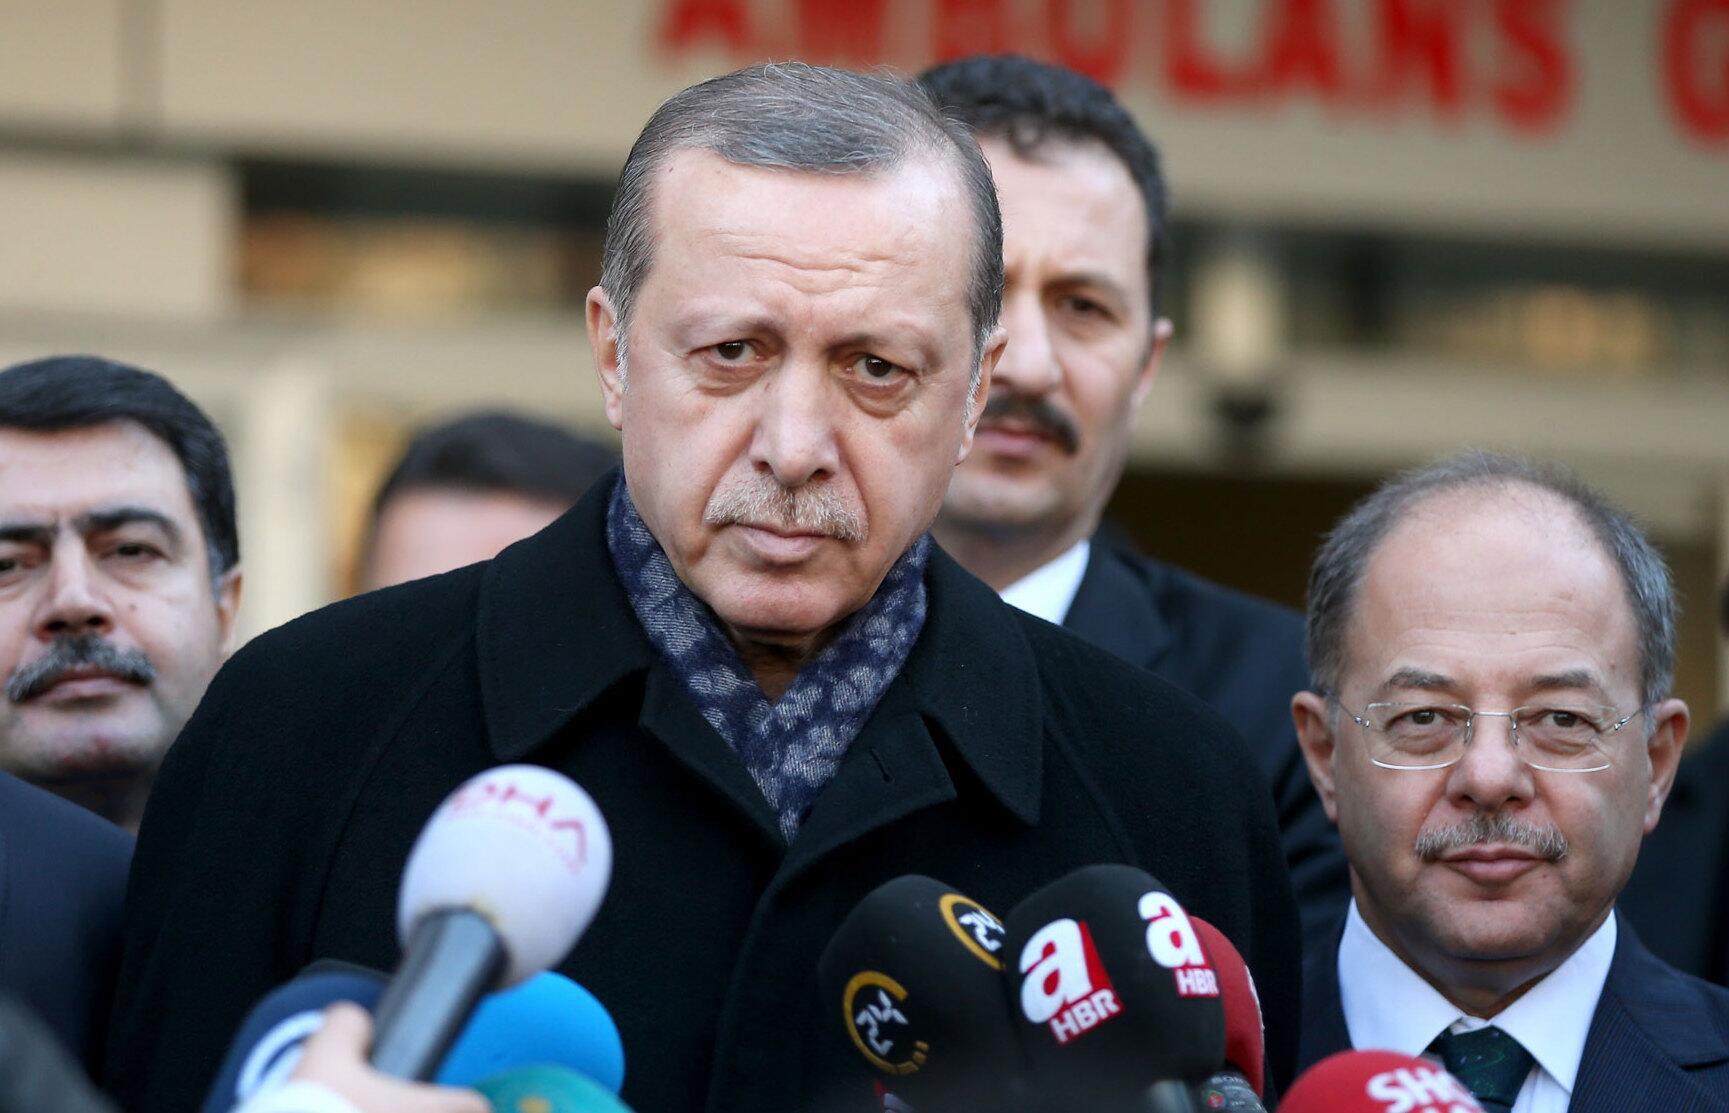 Bild zu Recep Tayyip Erdogan, Istanbul, Türkei, Anschläge